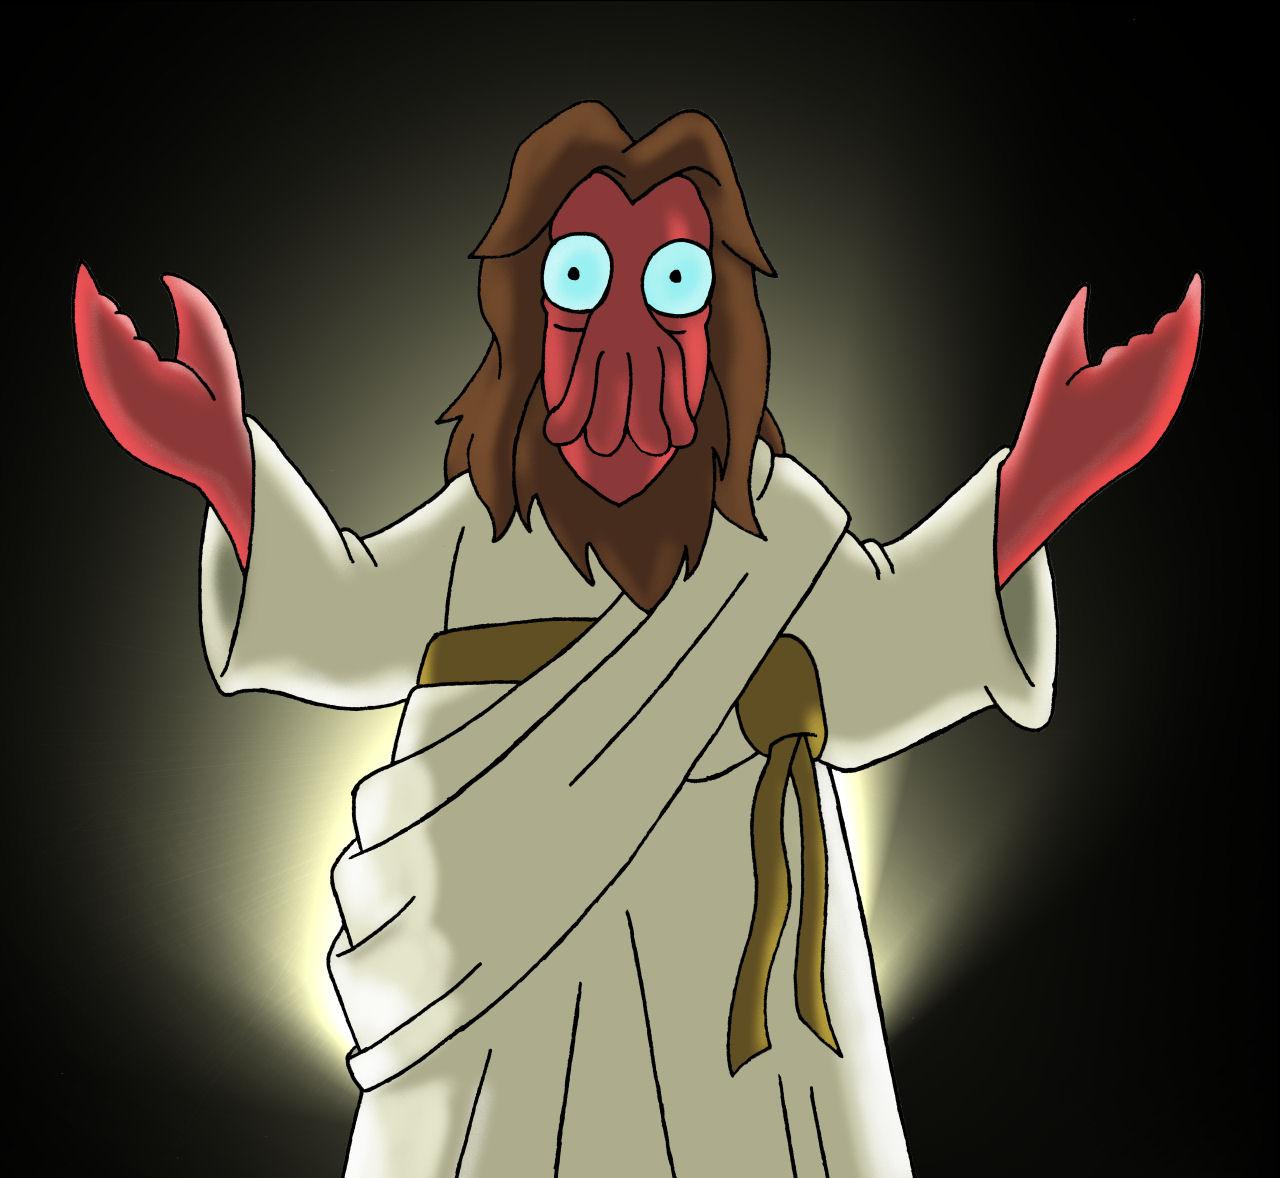 zoidberg jesus by gjones1 on deviantart